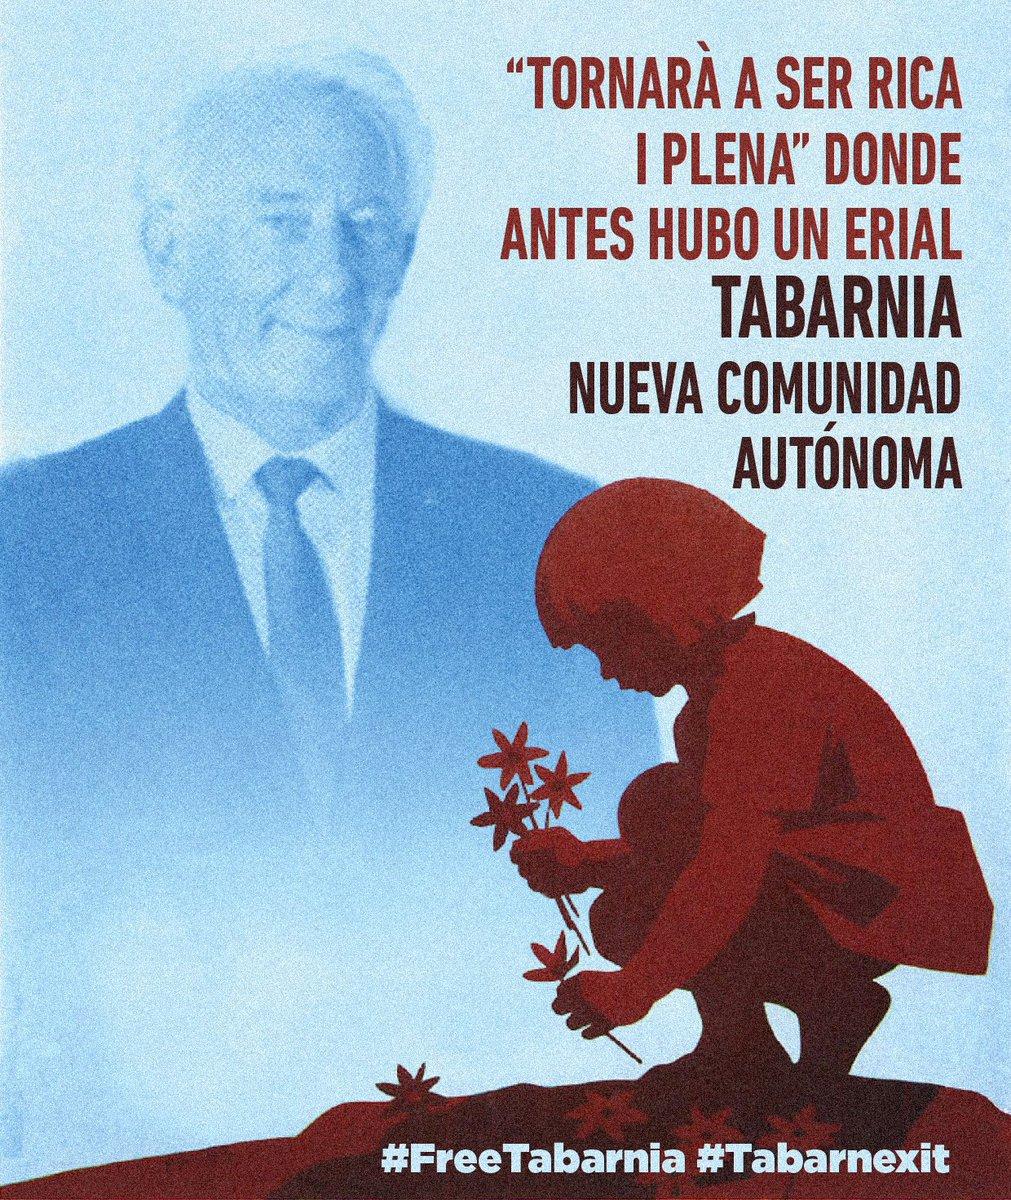 RT @TabarniaTGN: #Tabarnia #TabarniaisnotCatalonia #TabarniaLliure #FreeTabarnia #Tabarnexit https://t.co/YuYcMNc4pt